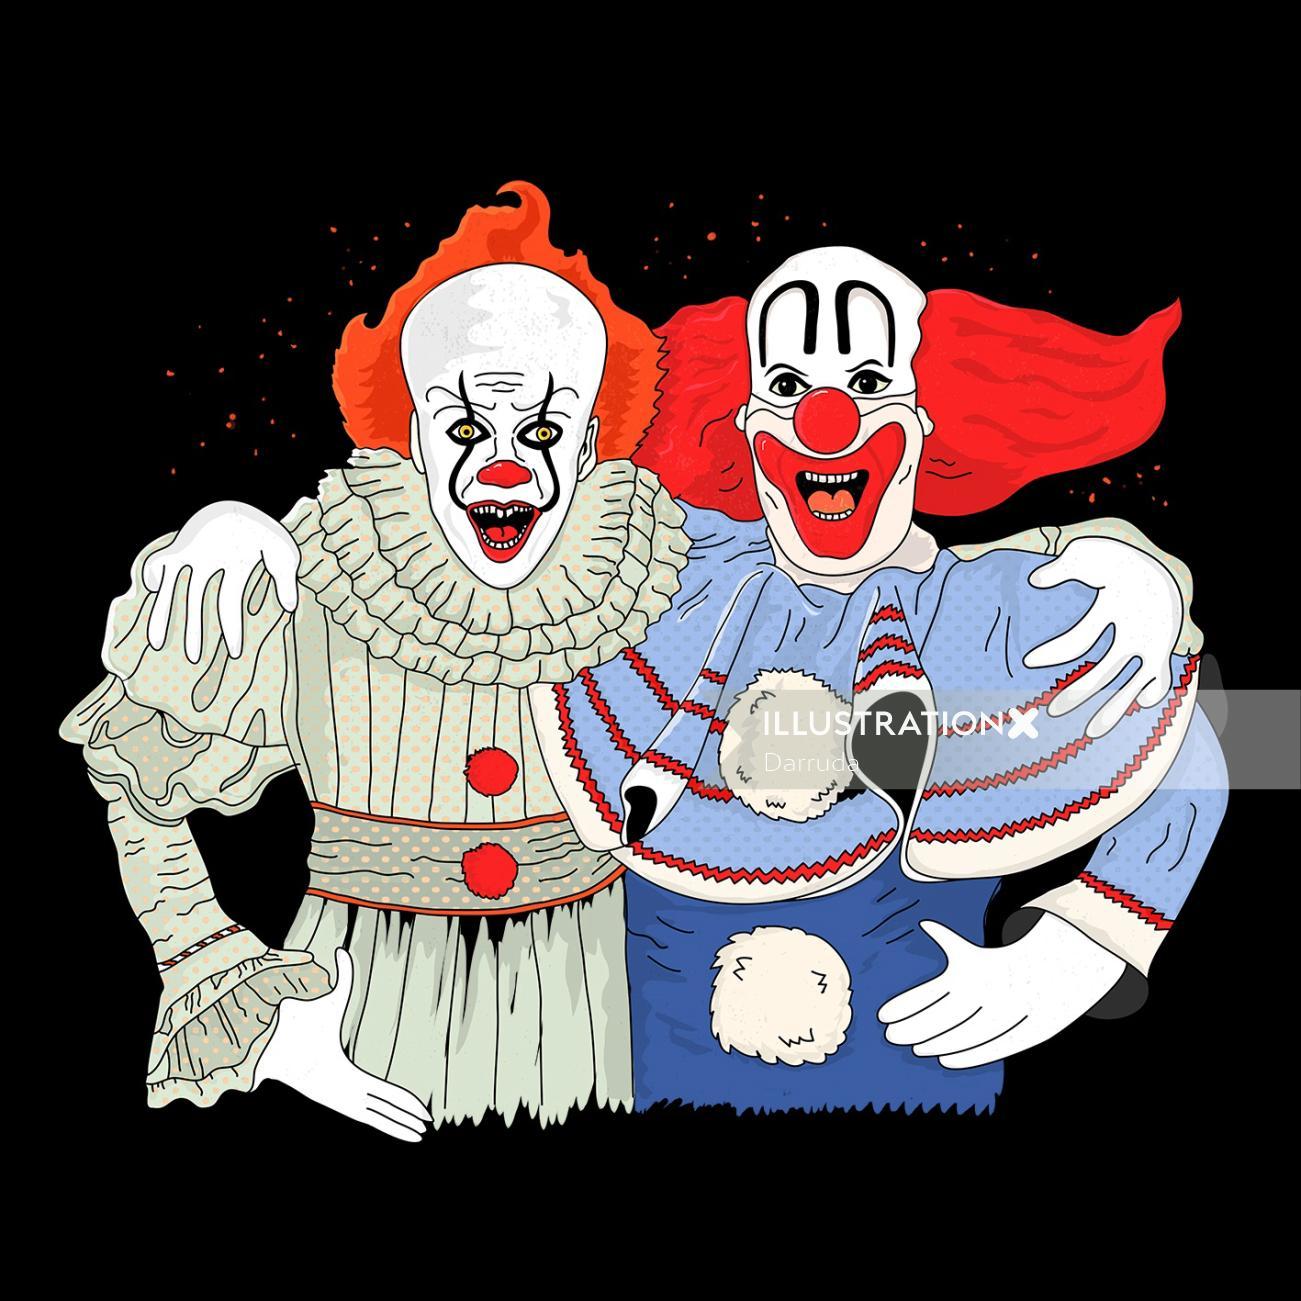 Comic art of jokers by Darruda